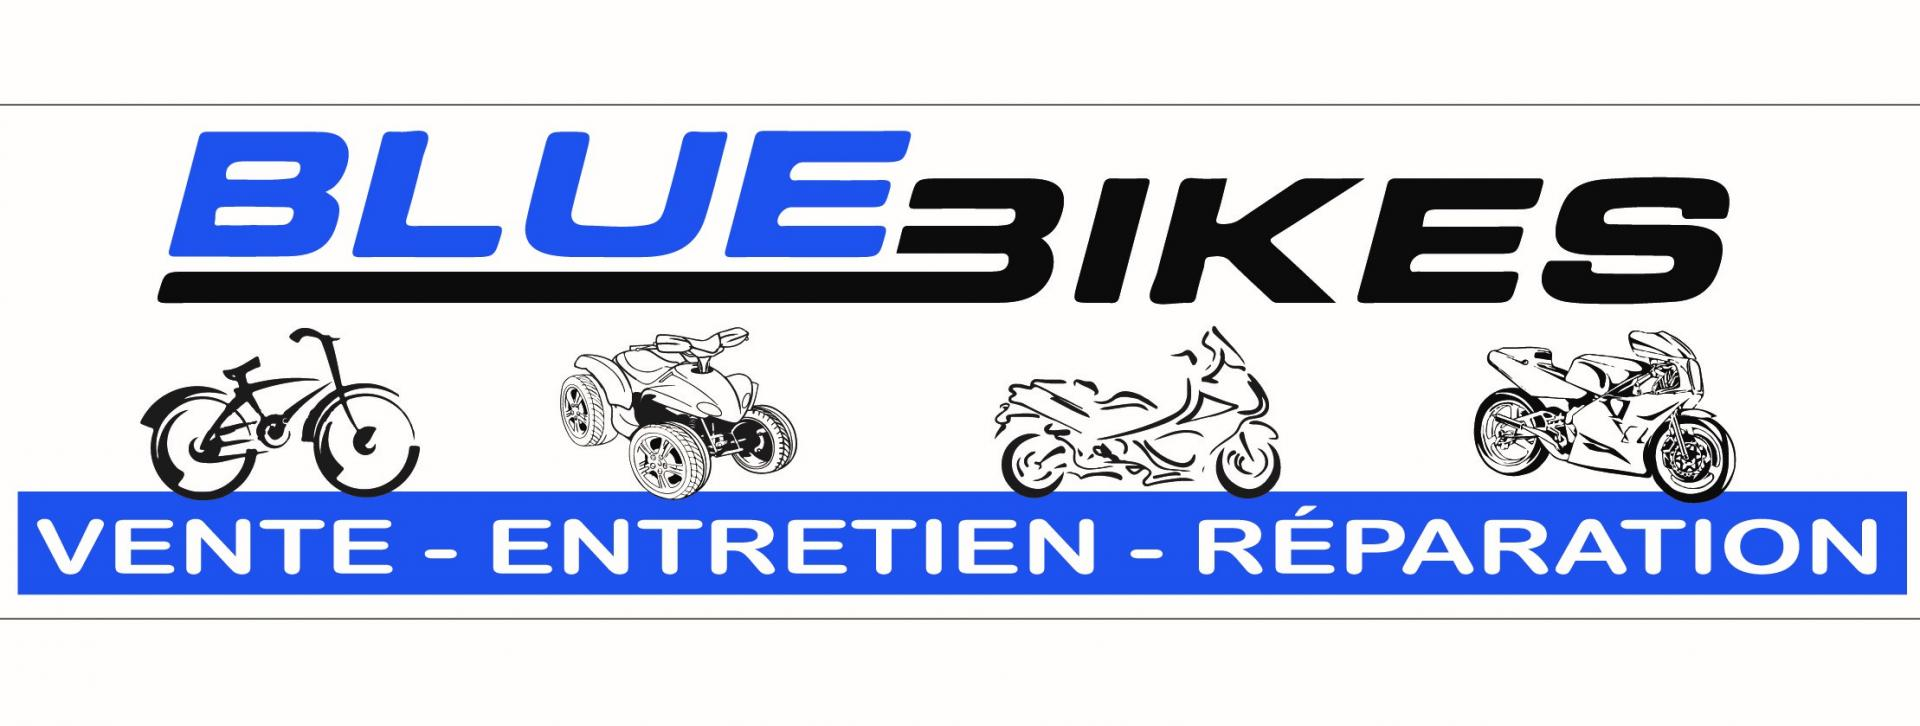 Enseigne bb vehicules vente entretien reparation